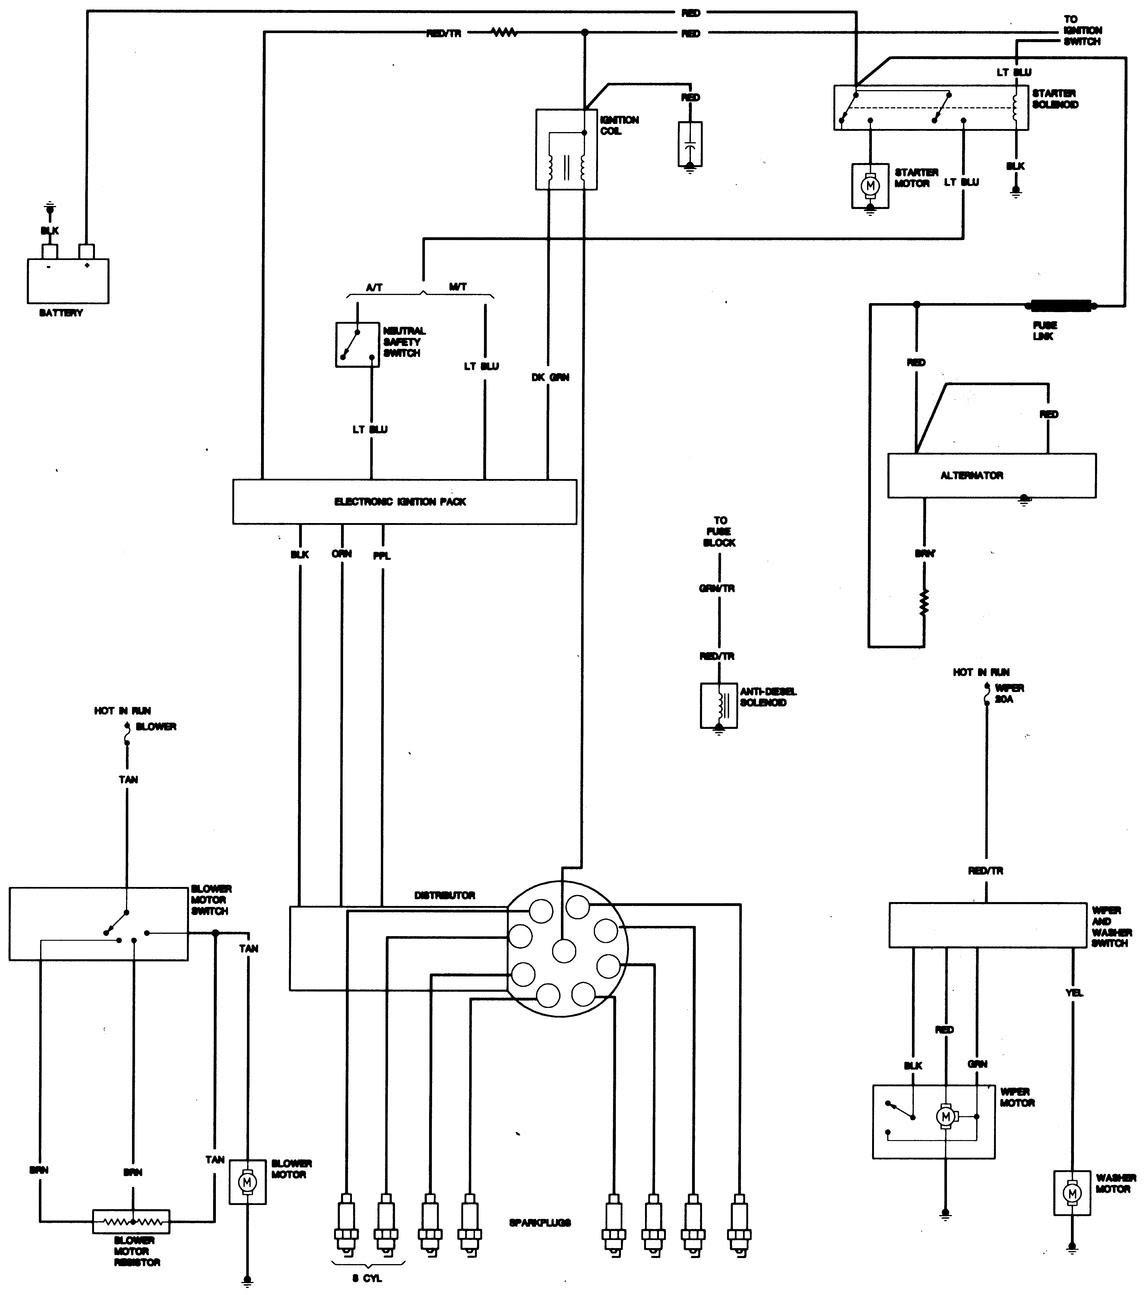 1968 Jeep Wiring Diagram Peugeot Boxer Wiring Diagram Download Duramaxxx Holden Commodore Jeanjaures37 Fr